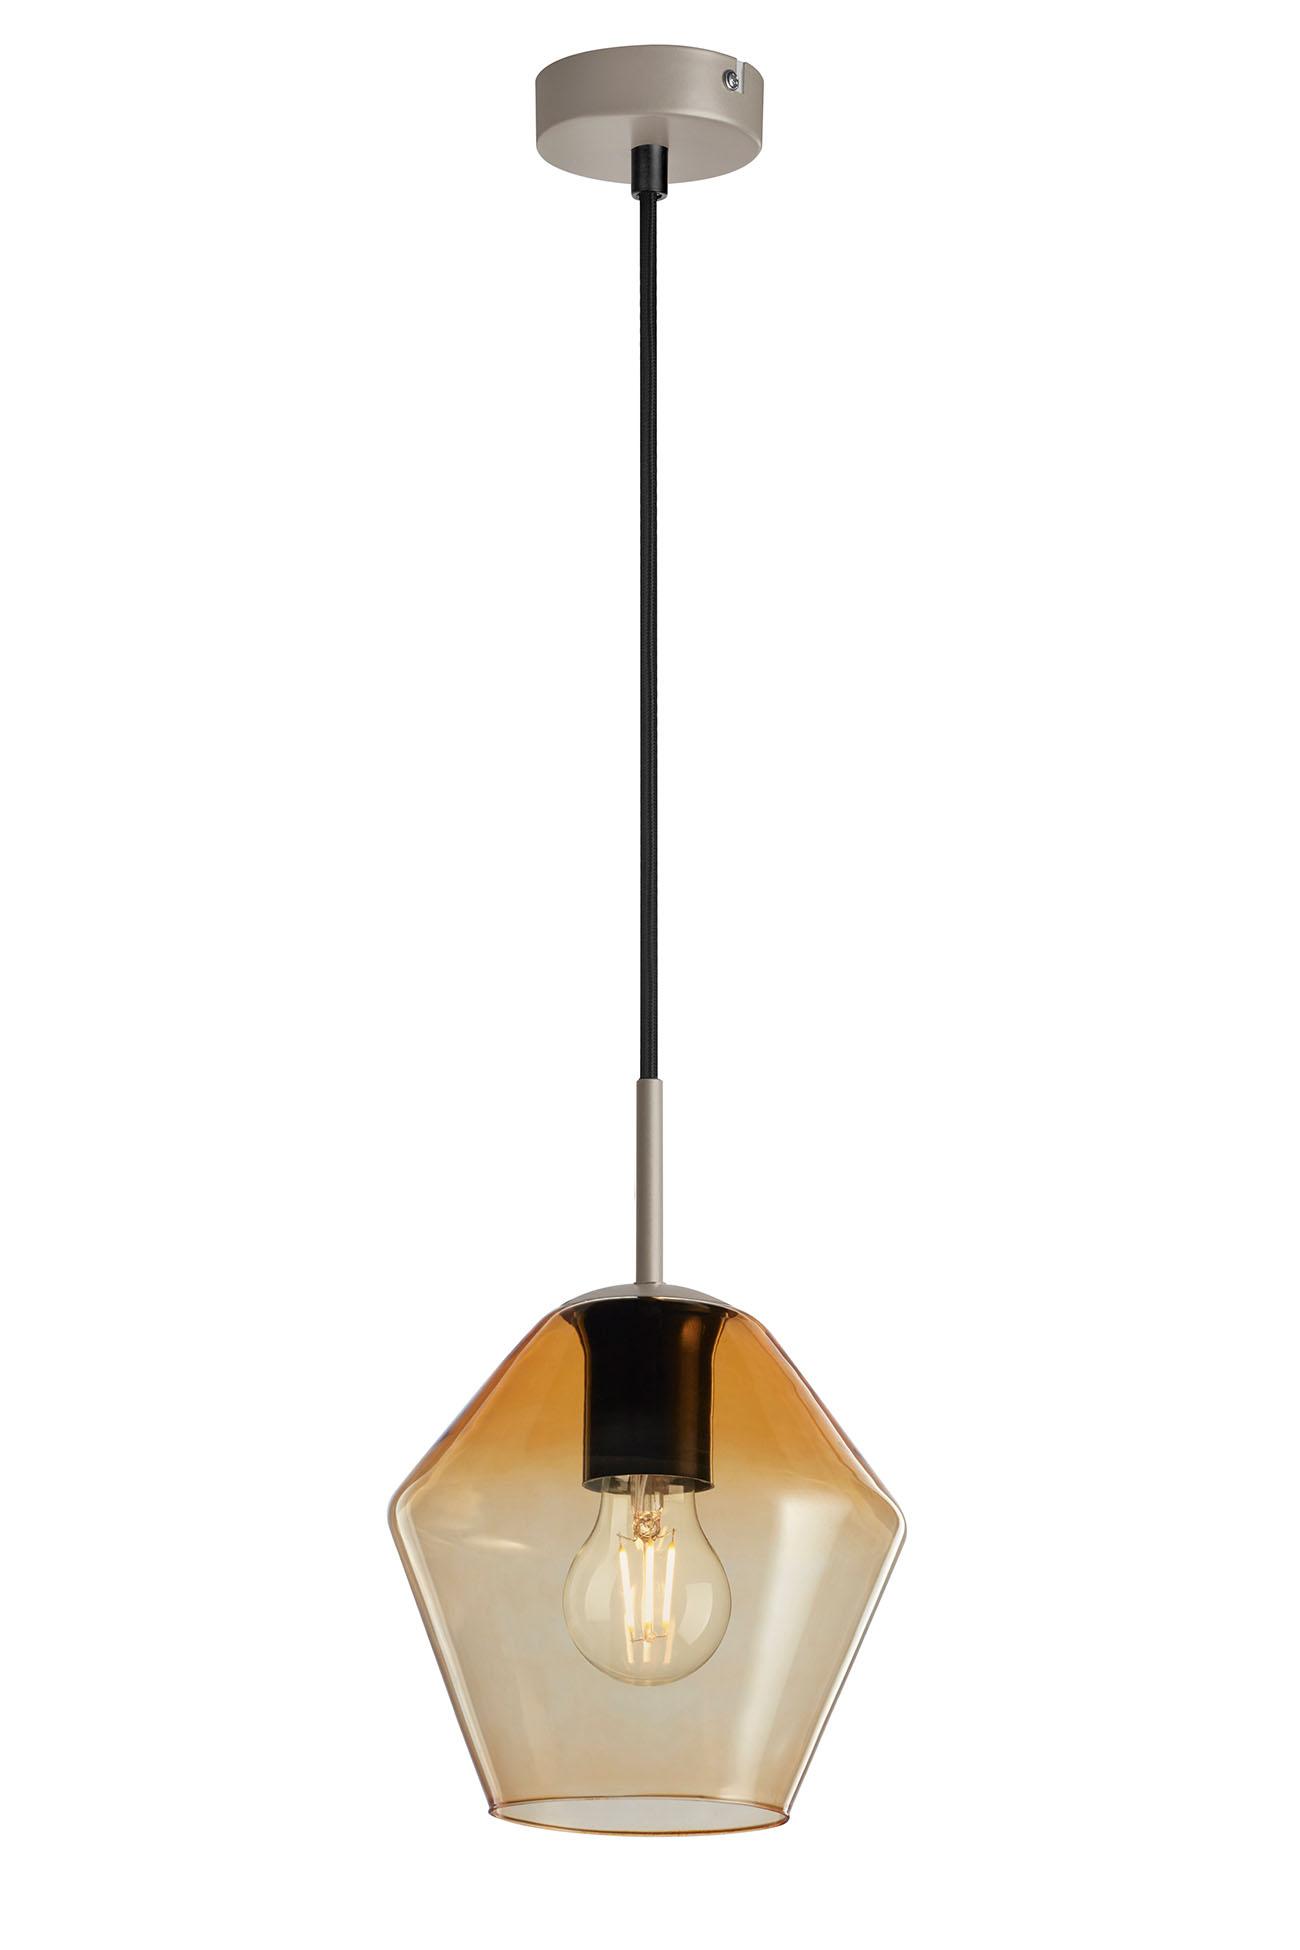 Pendelleuchte, Ø 19 cm, max. 40 W, Amber-Gold